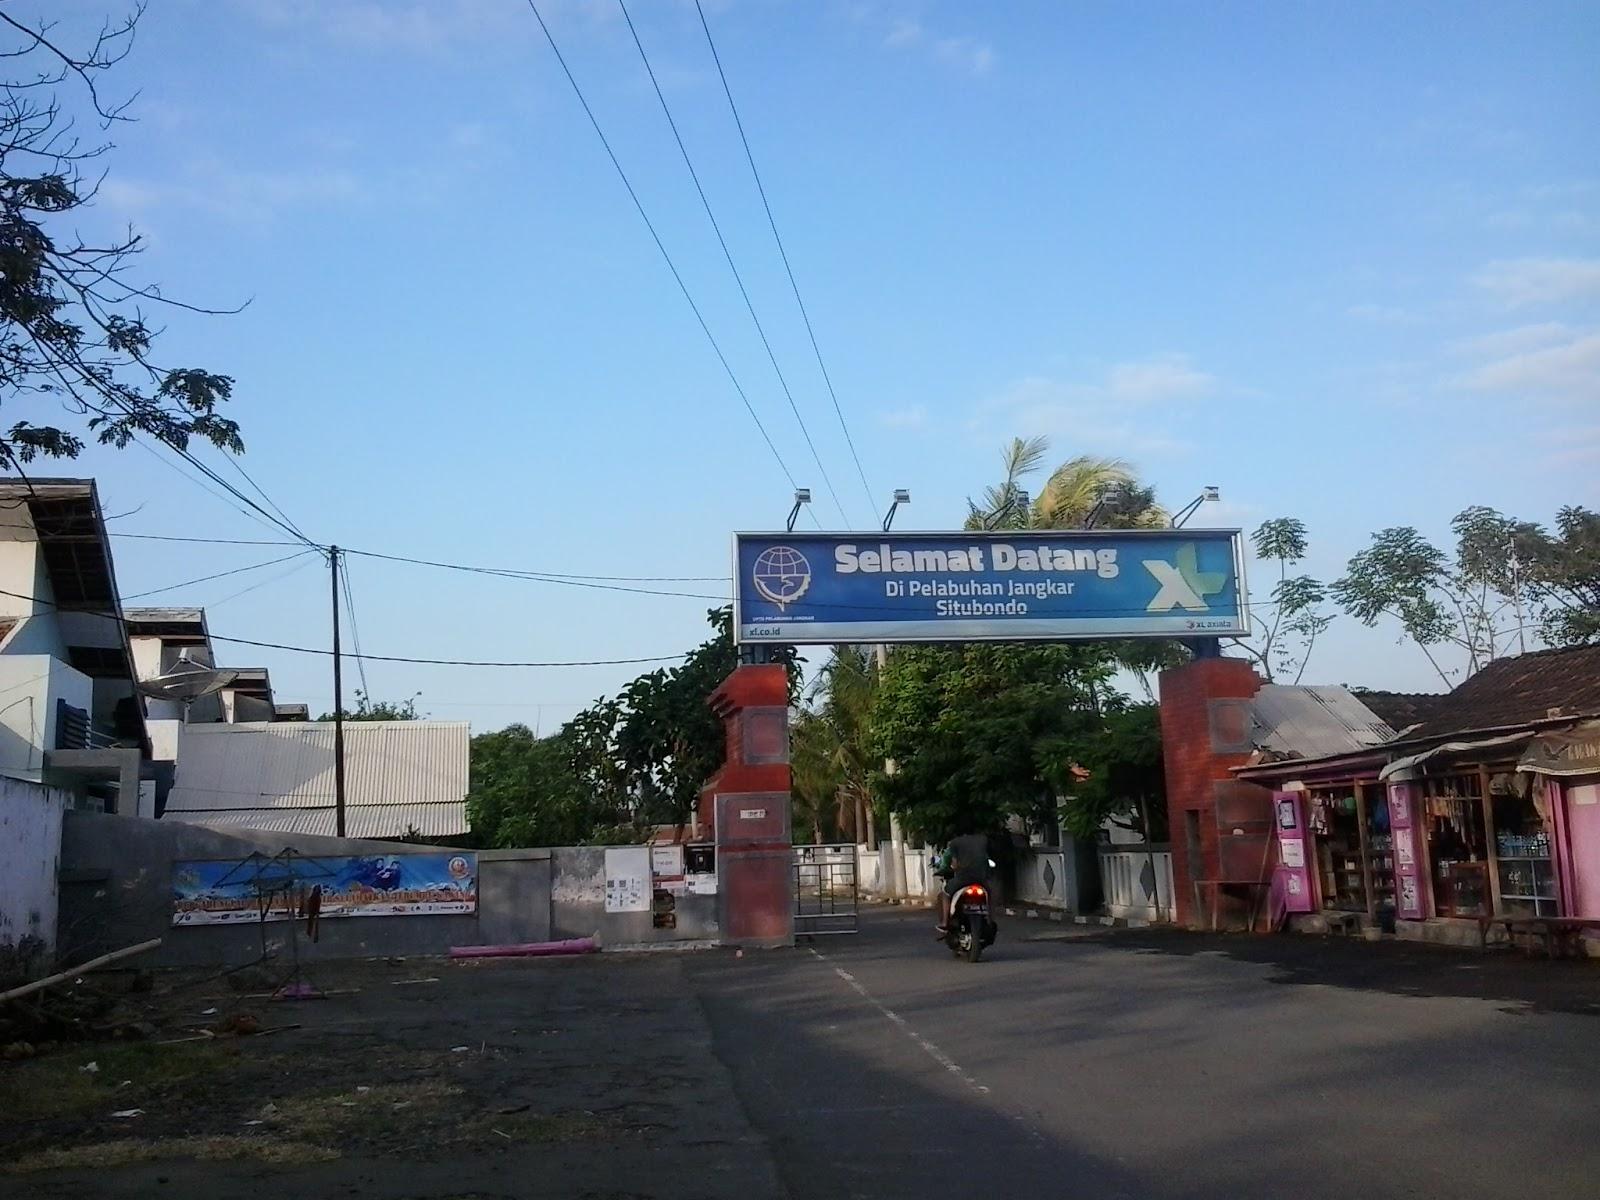 Pelabuhan Jangkar Situbondo Komunitas Penulis Muda Anggota Backpacker Tinggal Sekitaran